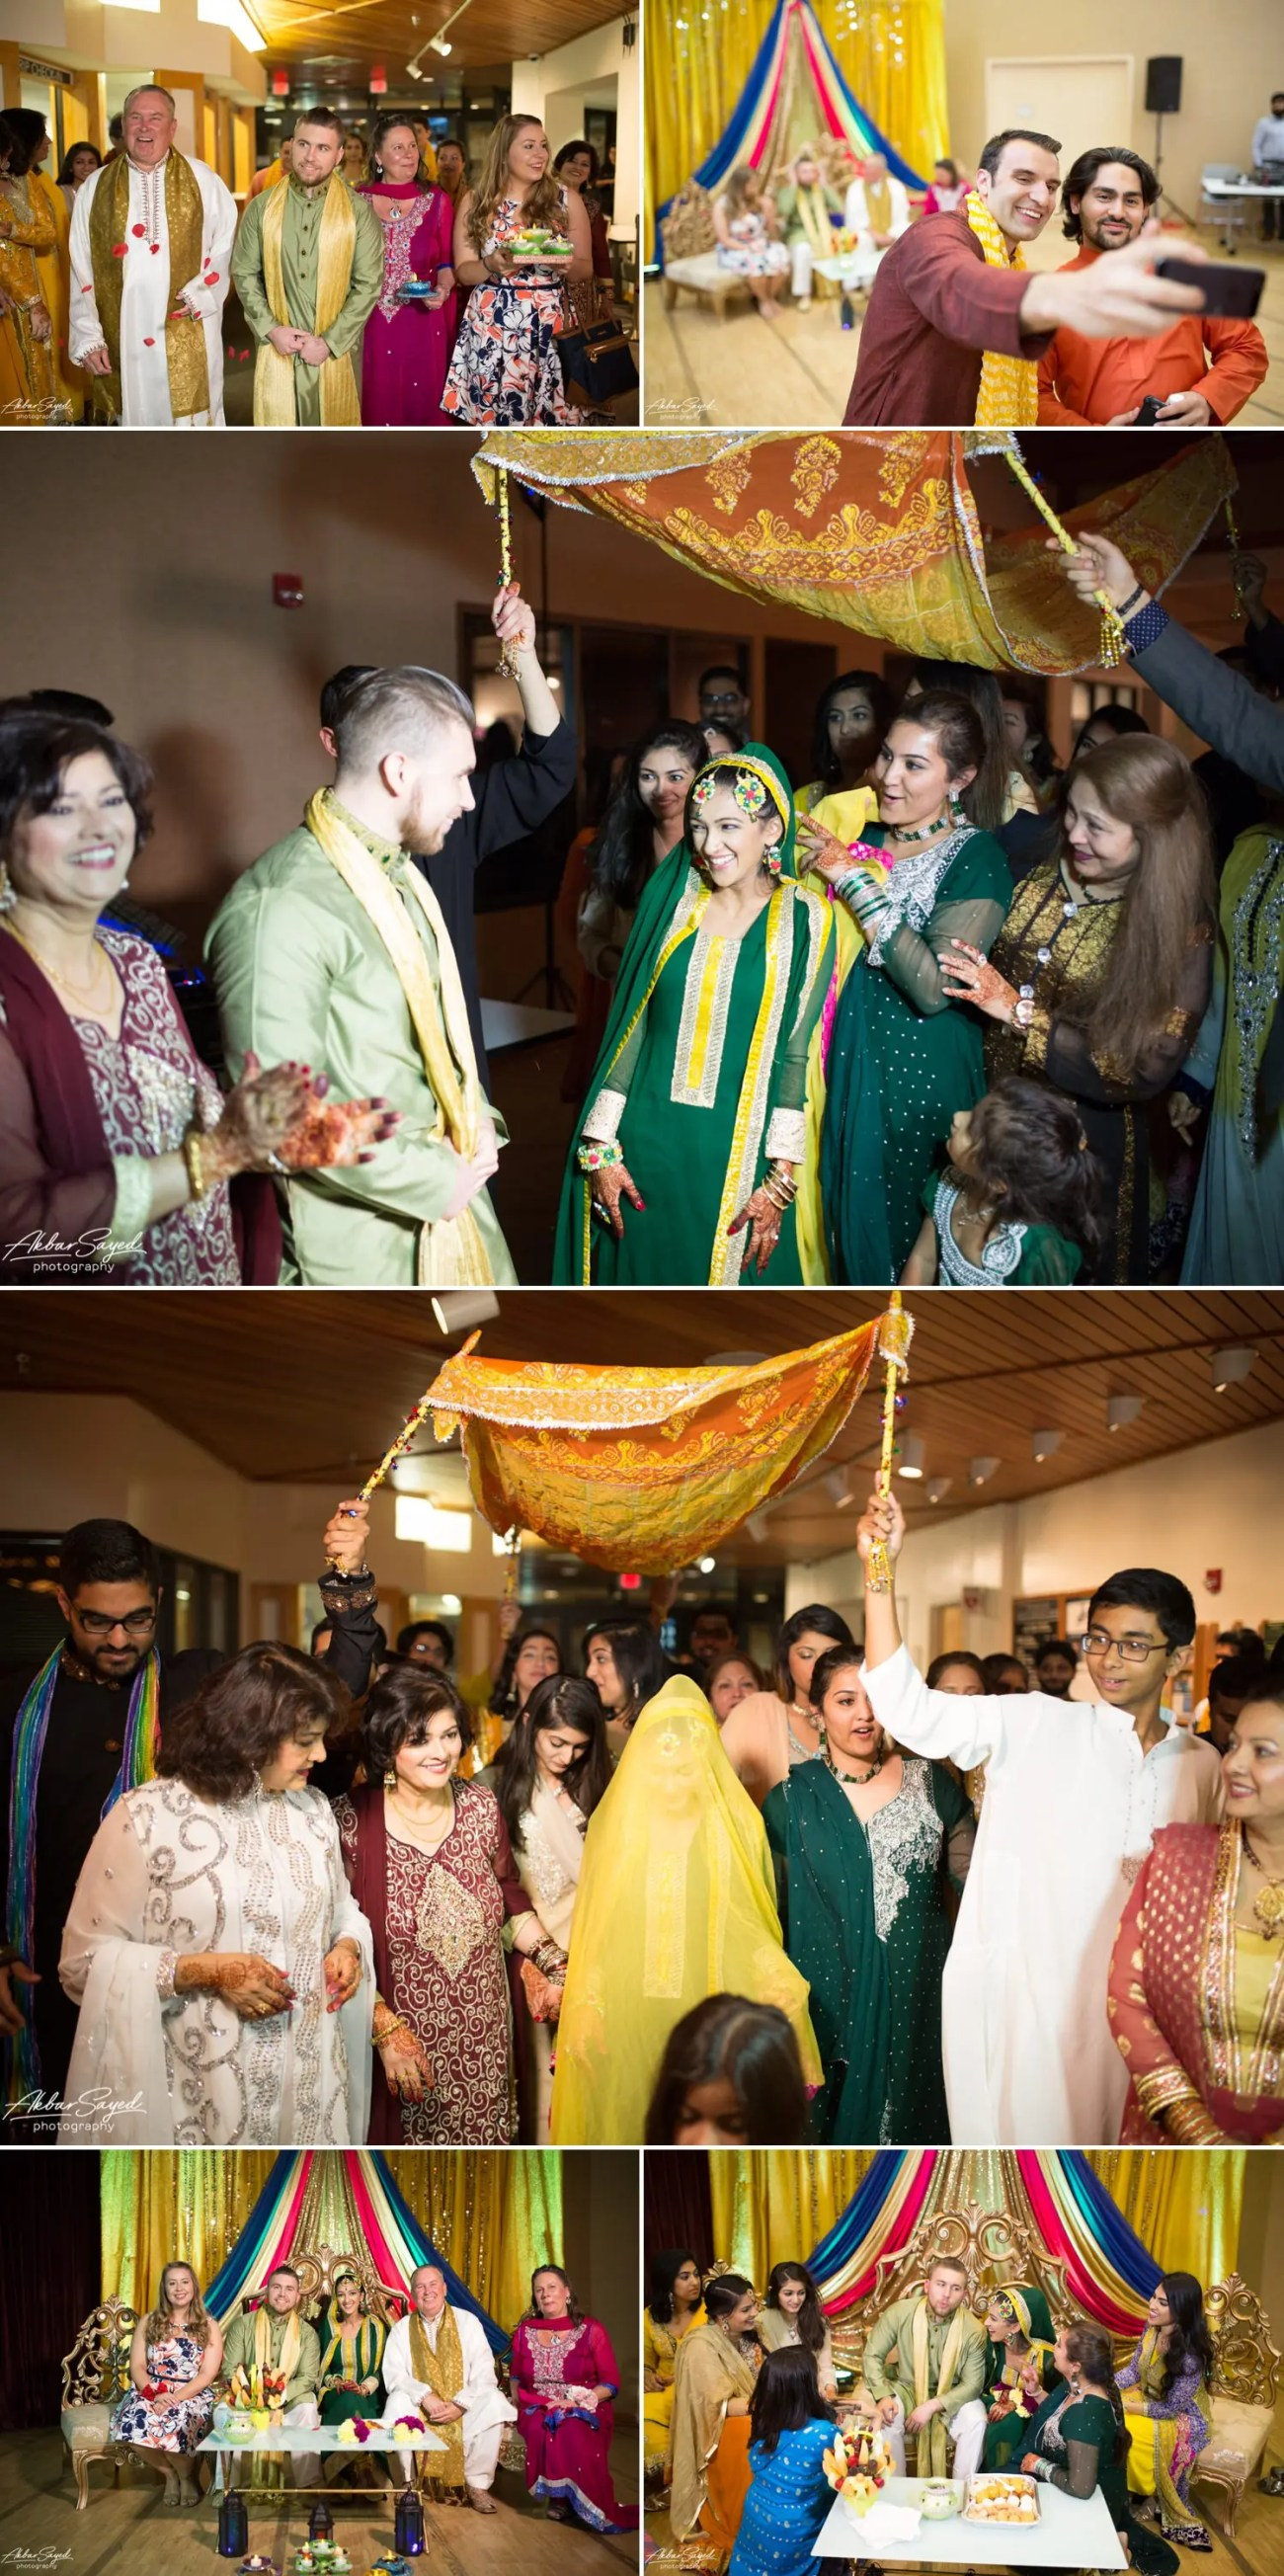 Anam and Josh - Reston Community Center Mehndi 4